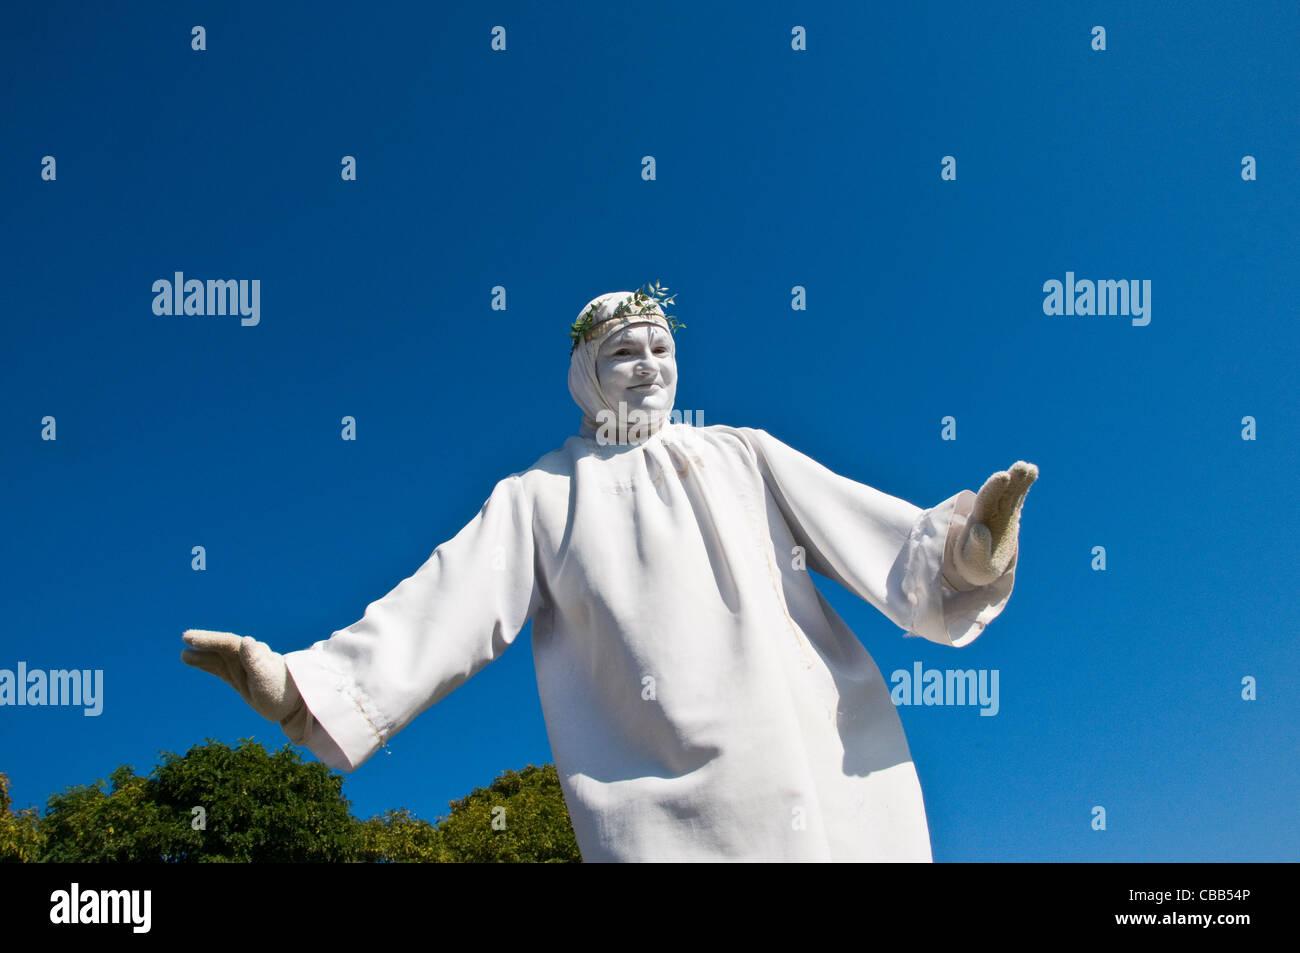 mime artist paris France - Stock Image